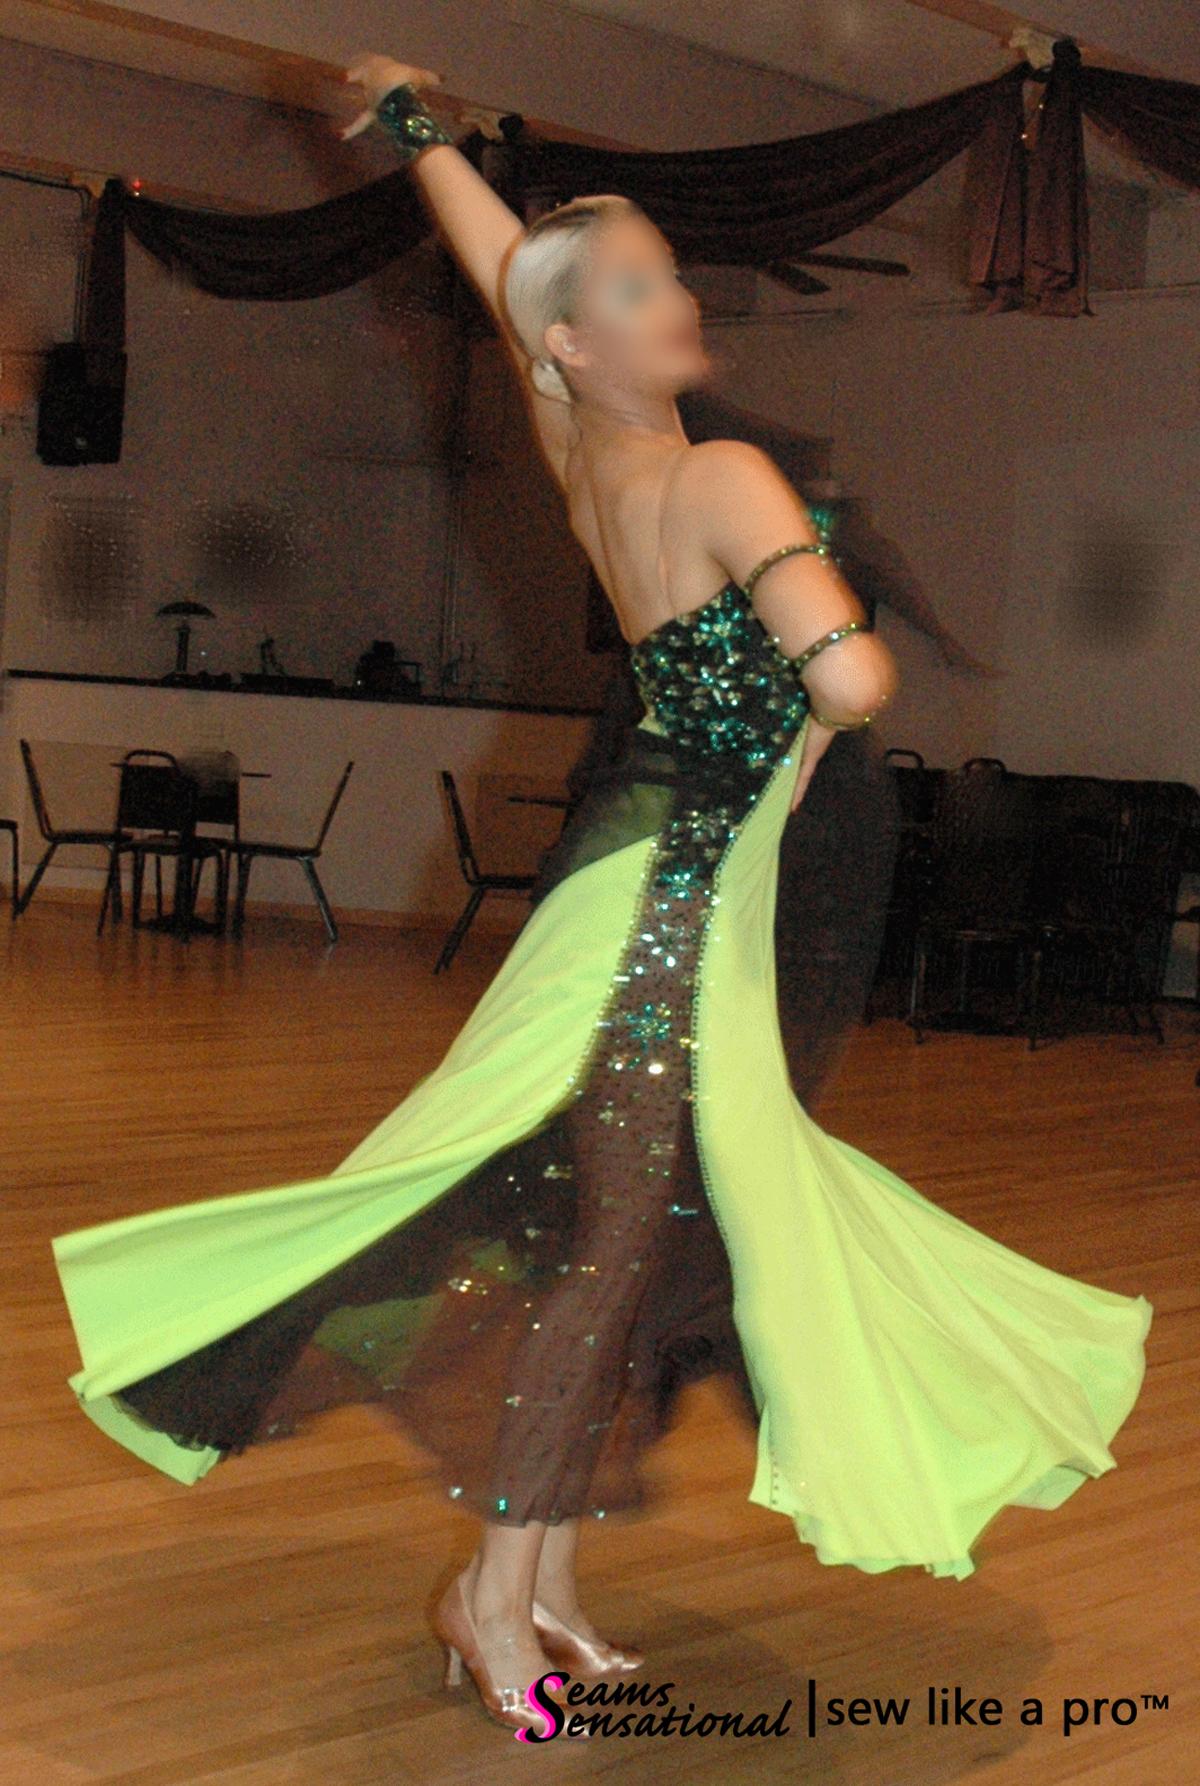 Key design element: contrasting sheer skirt panel on the competition Dancesport ballgown